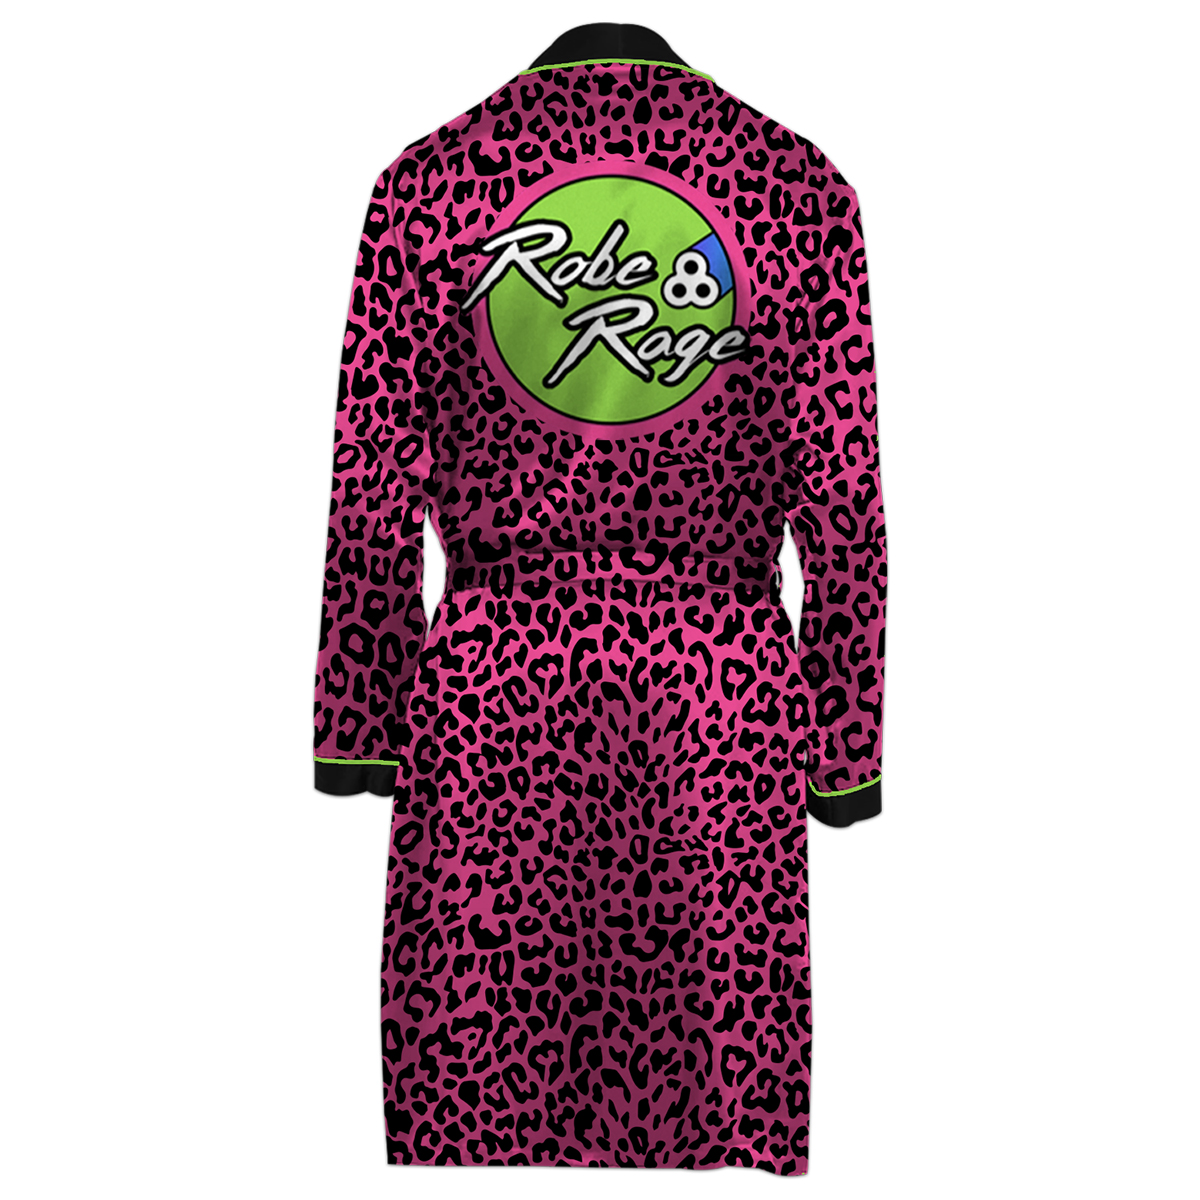 Robe Rage Satin Robe